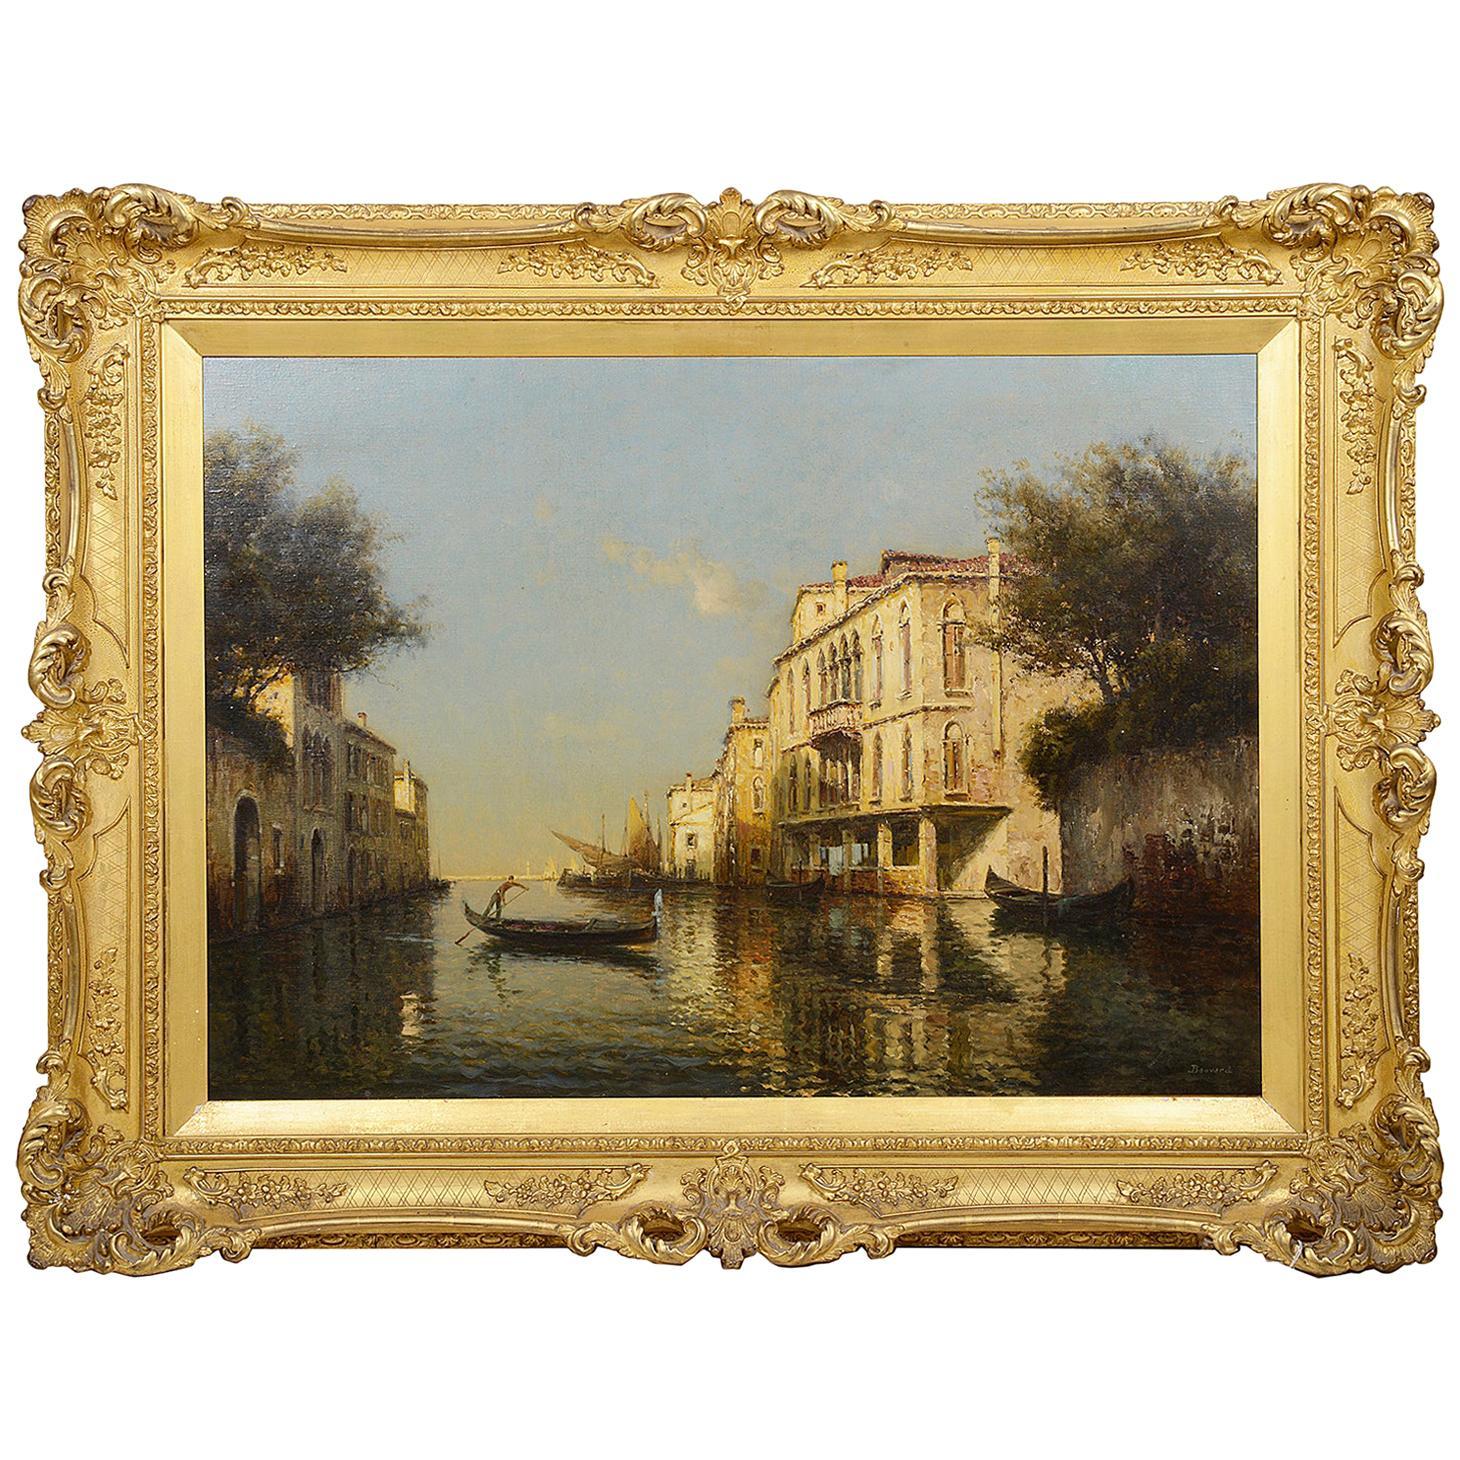 Oil on Canvas, Venetian Canal by Antonio Bouvard, 1910-1930